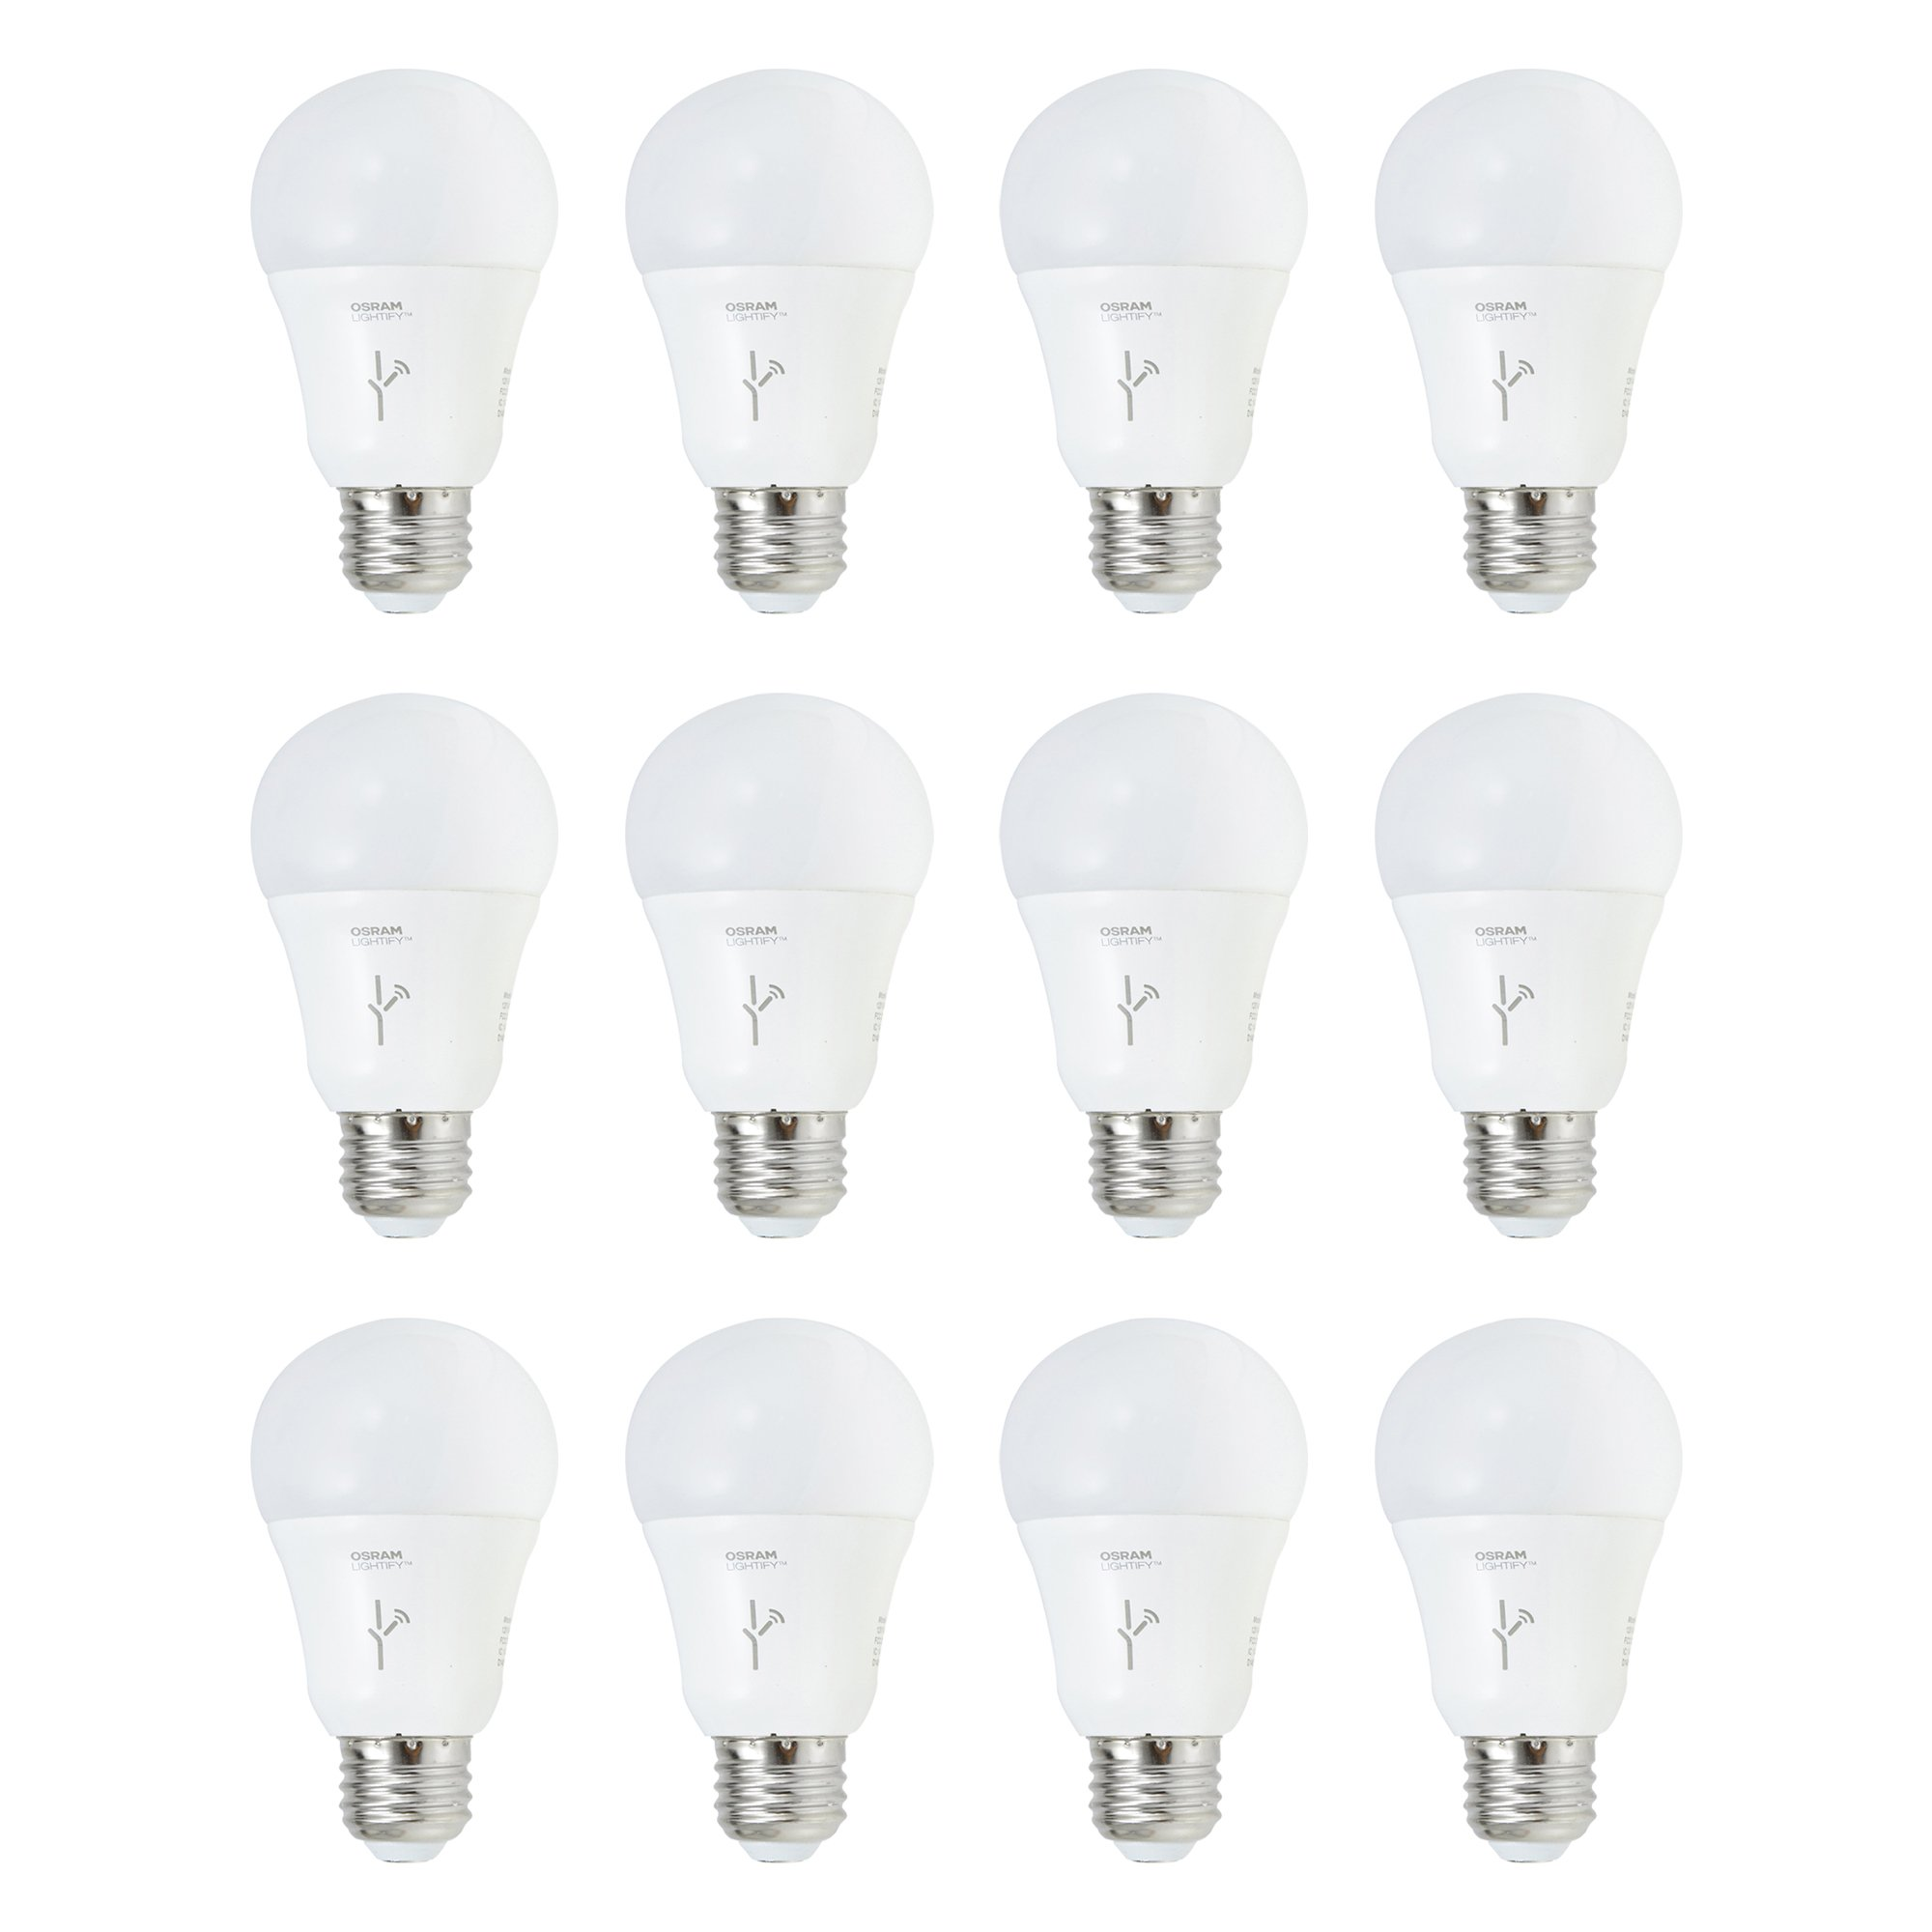 Sylvania Lightify 60-Watt A19 Tunable White Smart Home LED Light Bulb (12 Pack)